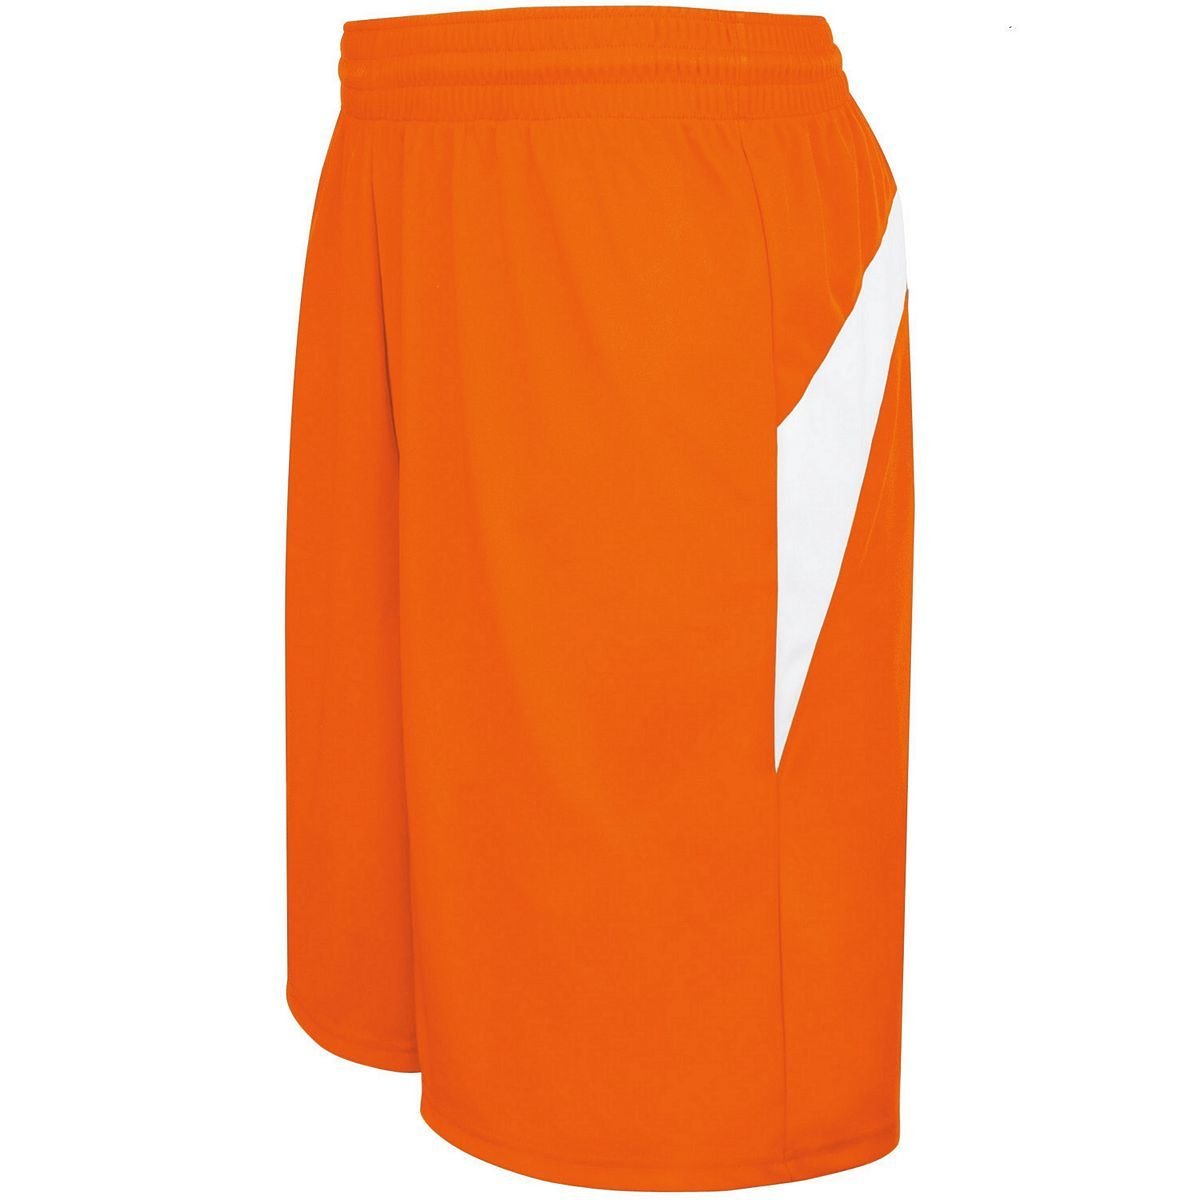 Adult Transition Game Shorts - ORANGE/WHITE